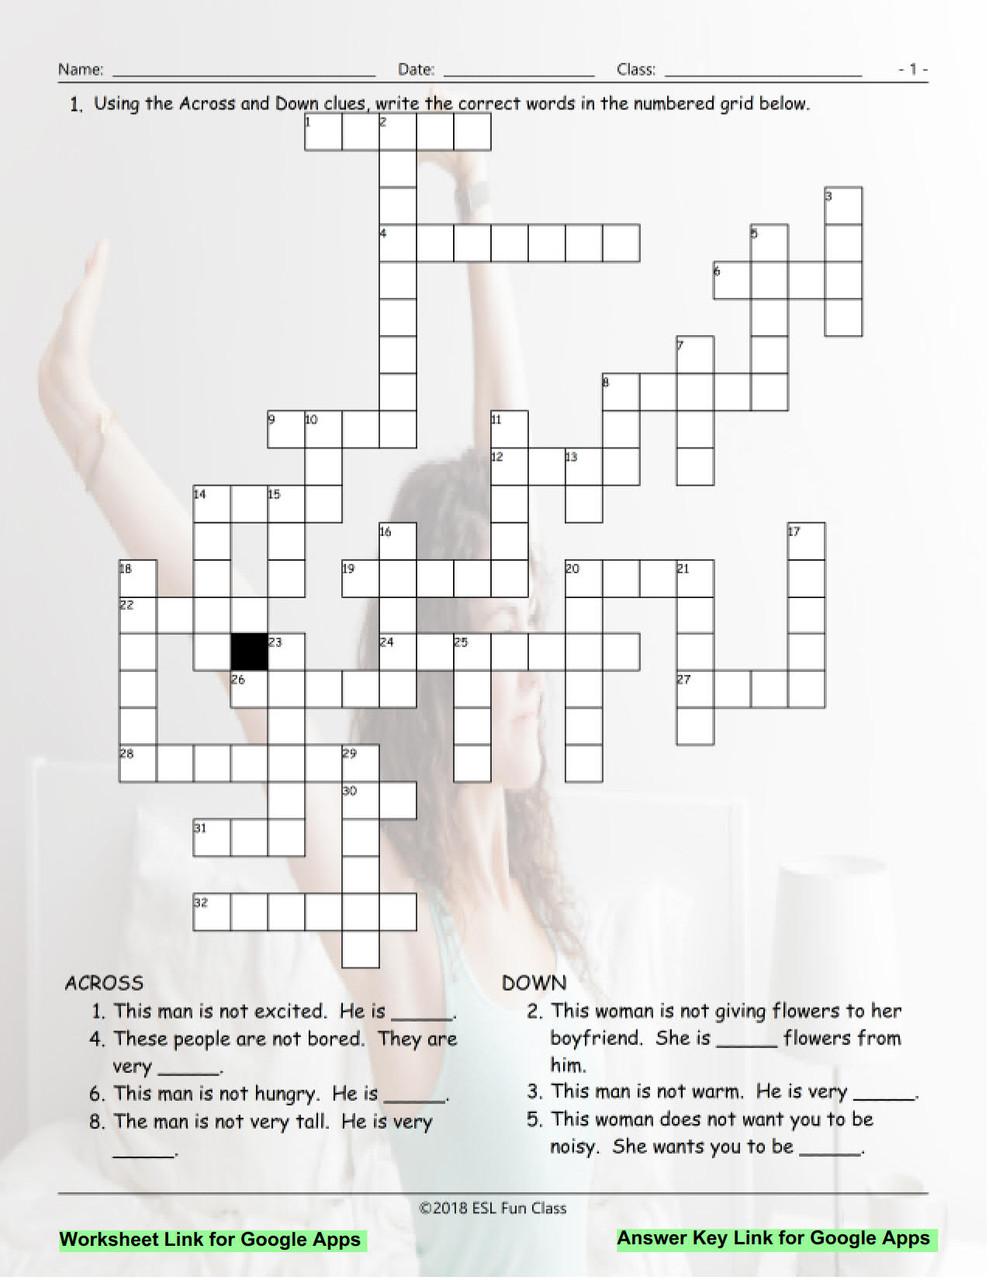 Antonyms Interactive Crossword Puzzle For Google Apps Links